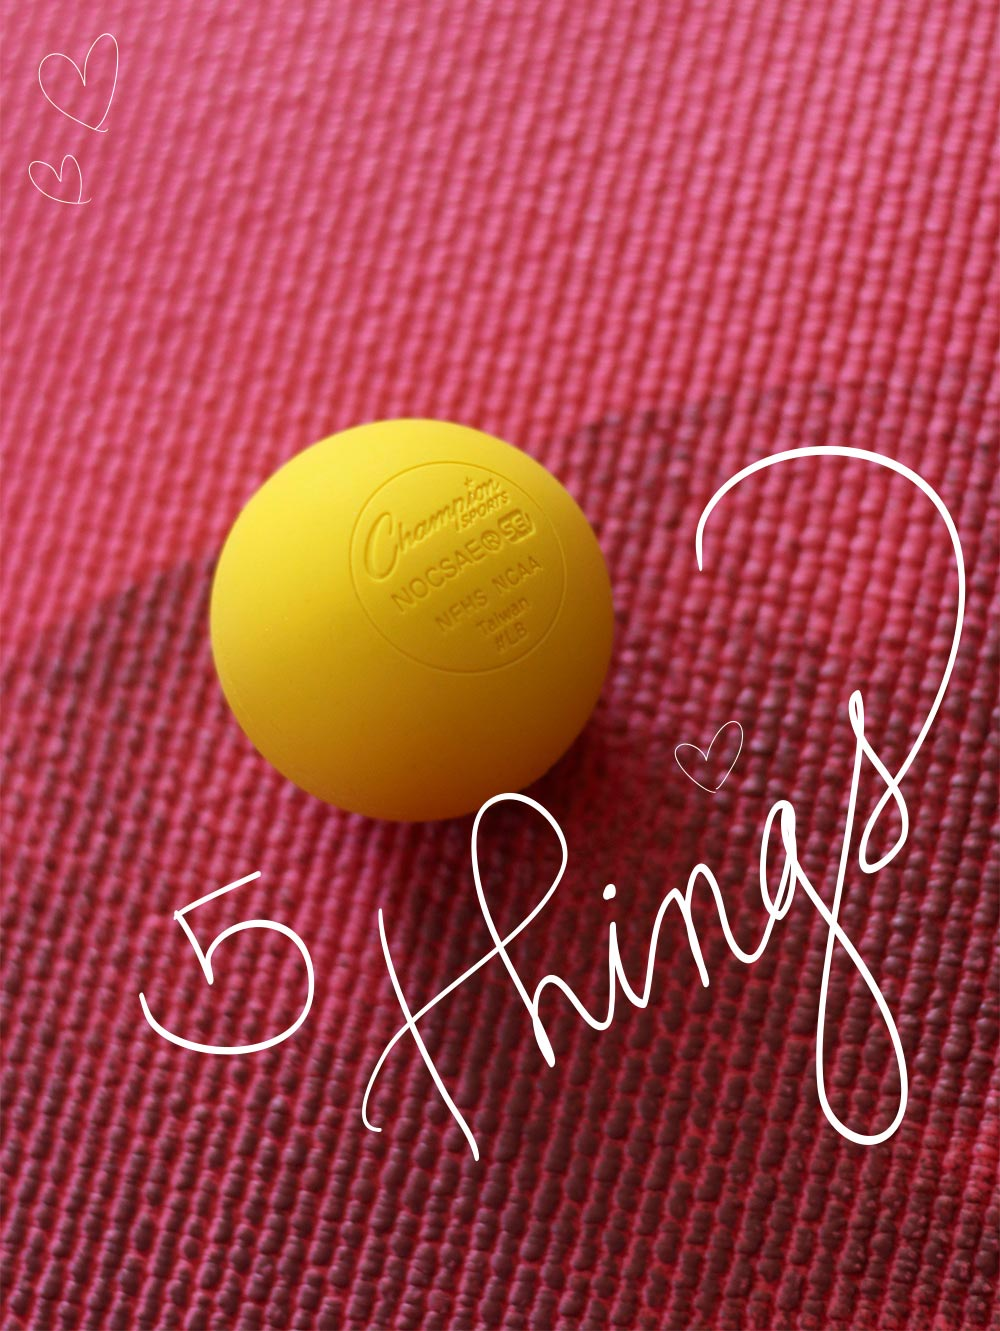 lacrosse massage ball top